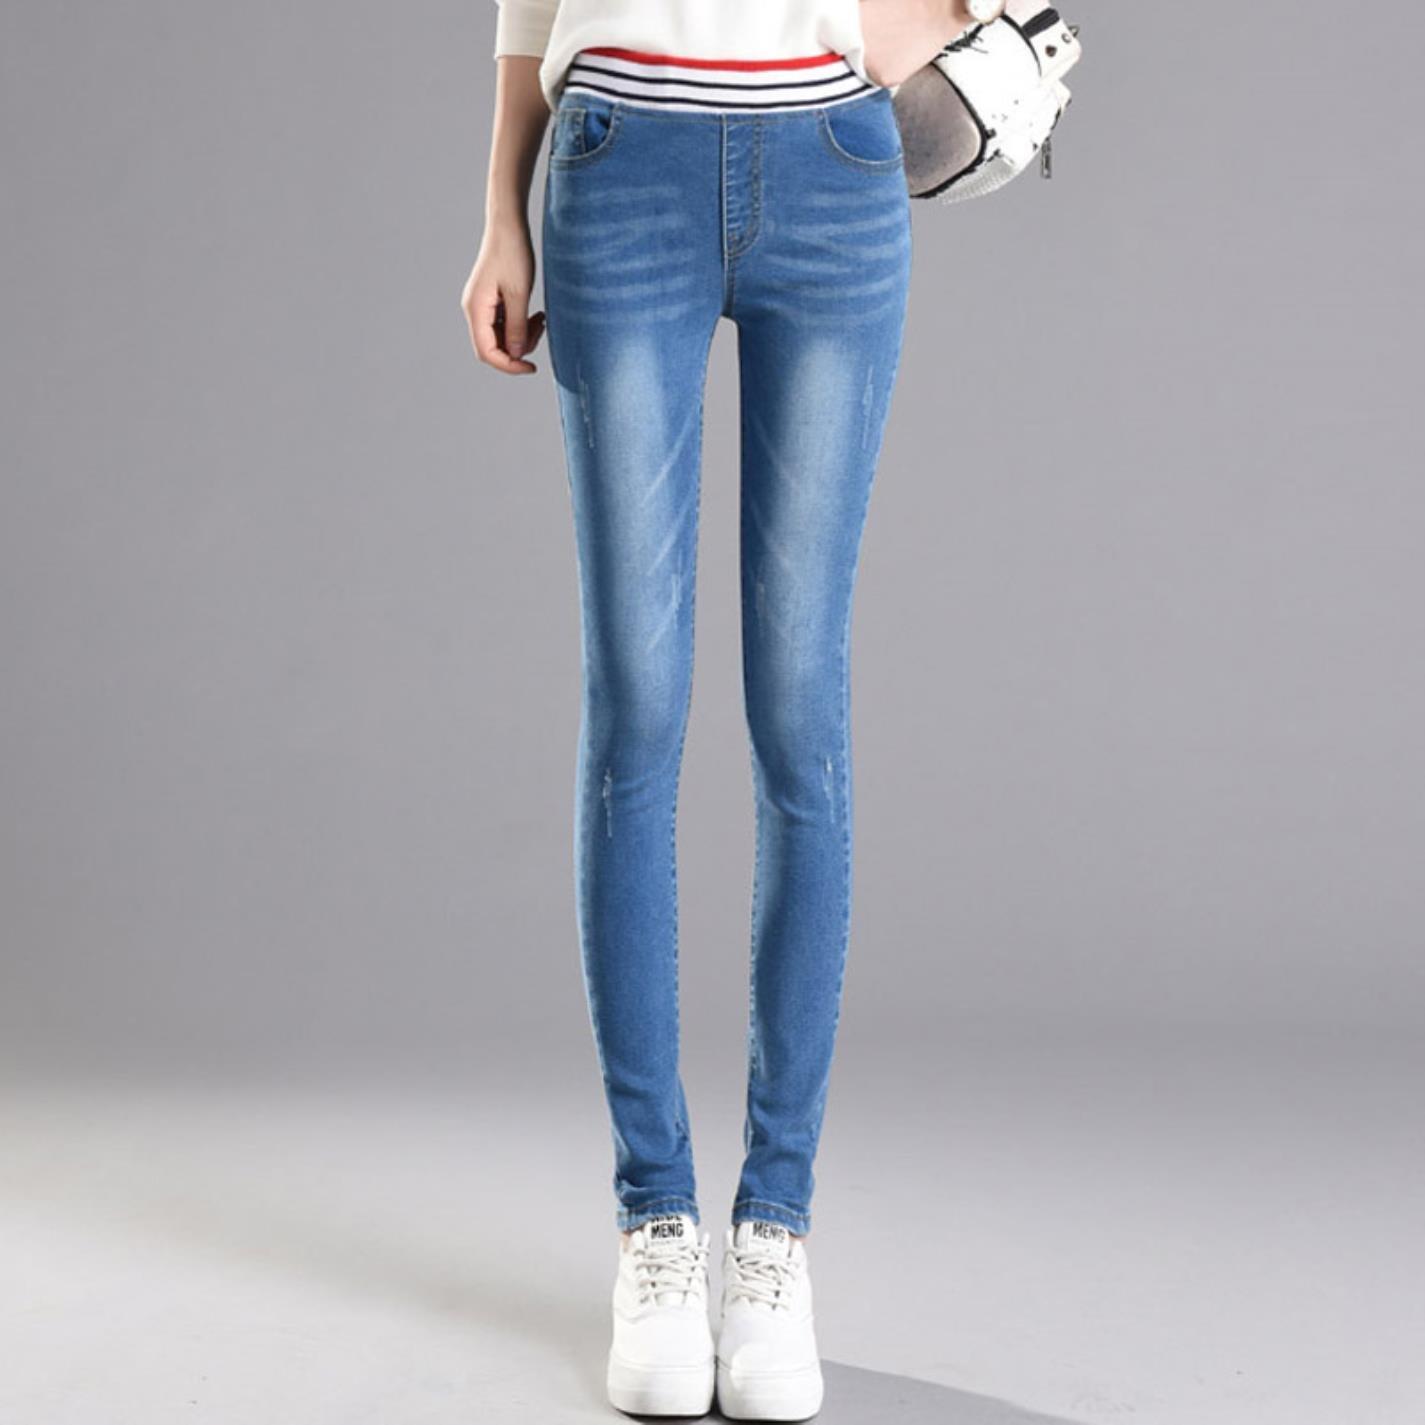 yubanten Woman Vintage Mom Fit Mid Waist Elastic Jeans